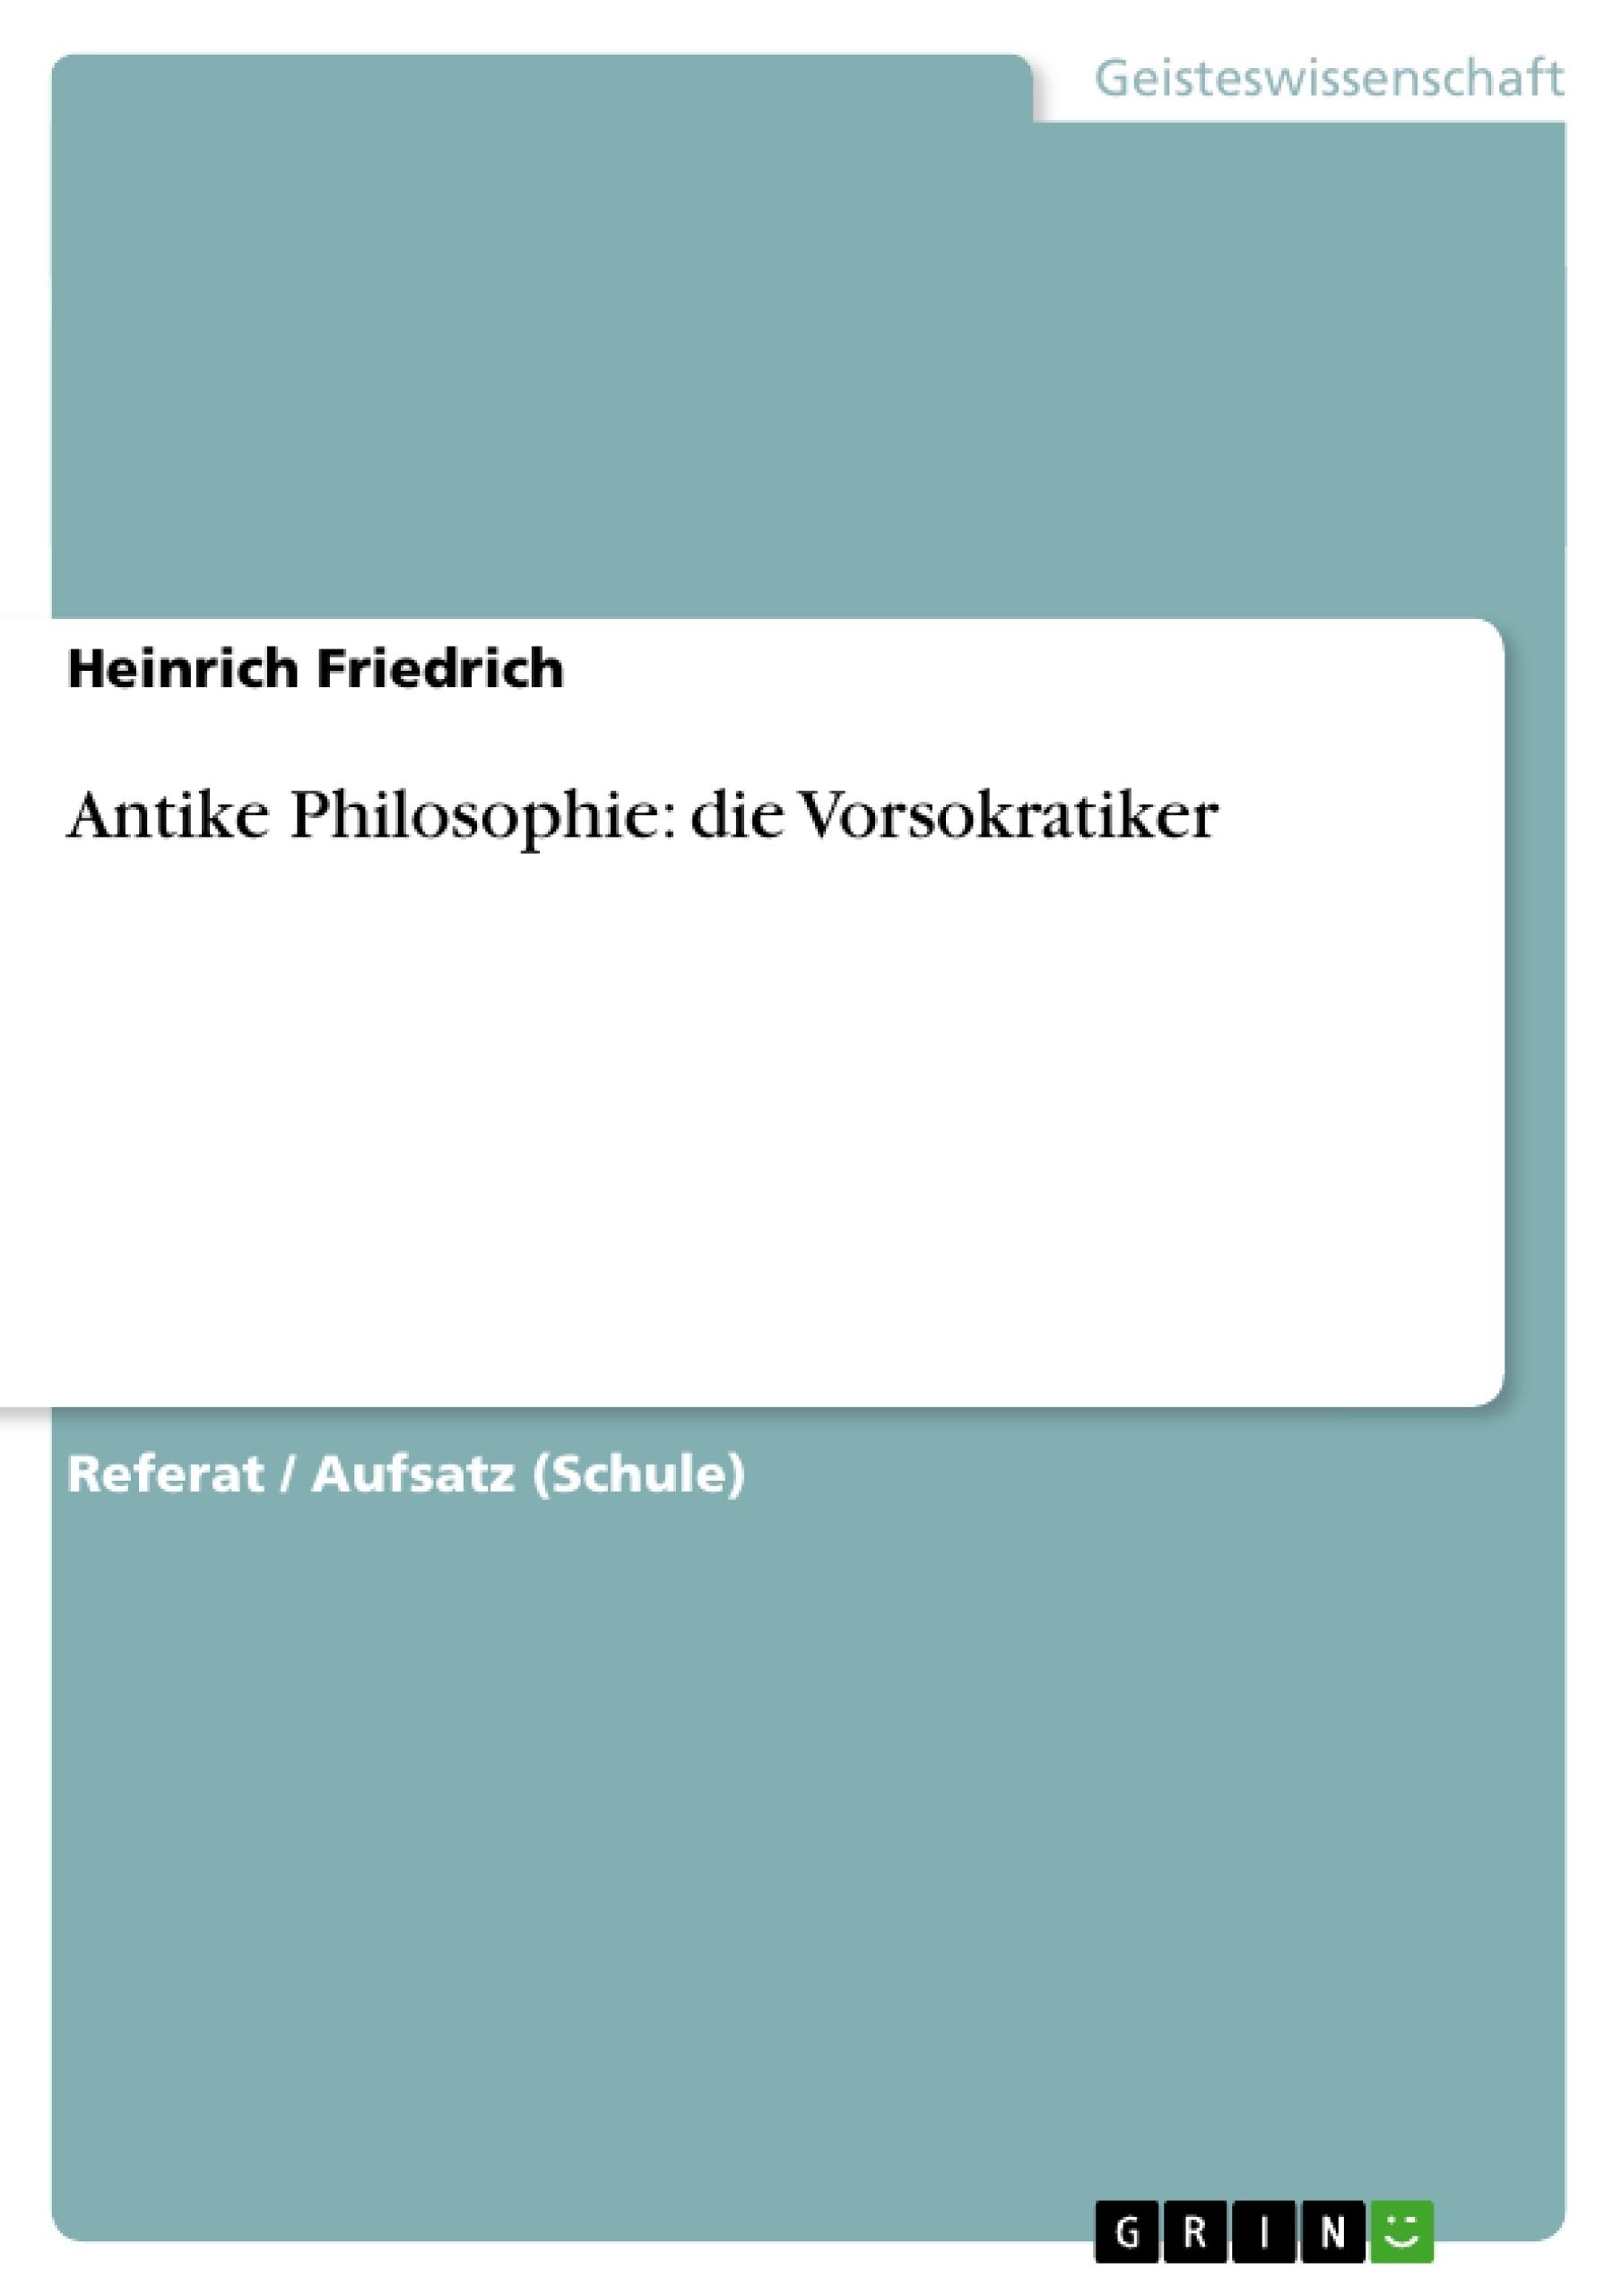 Titel: Antike Philosophie: die Vorsokratiker